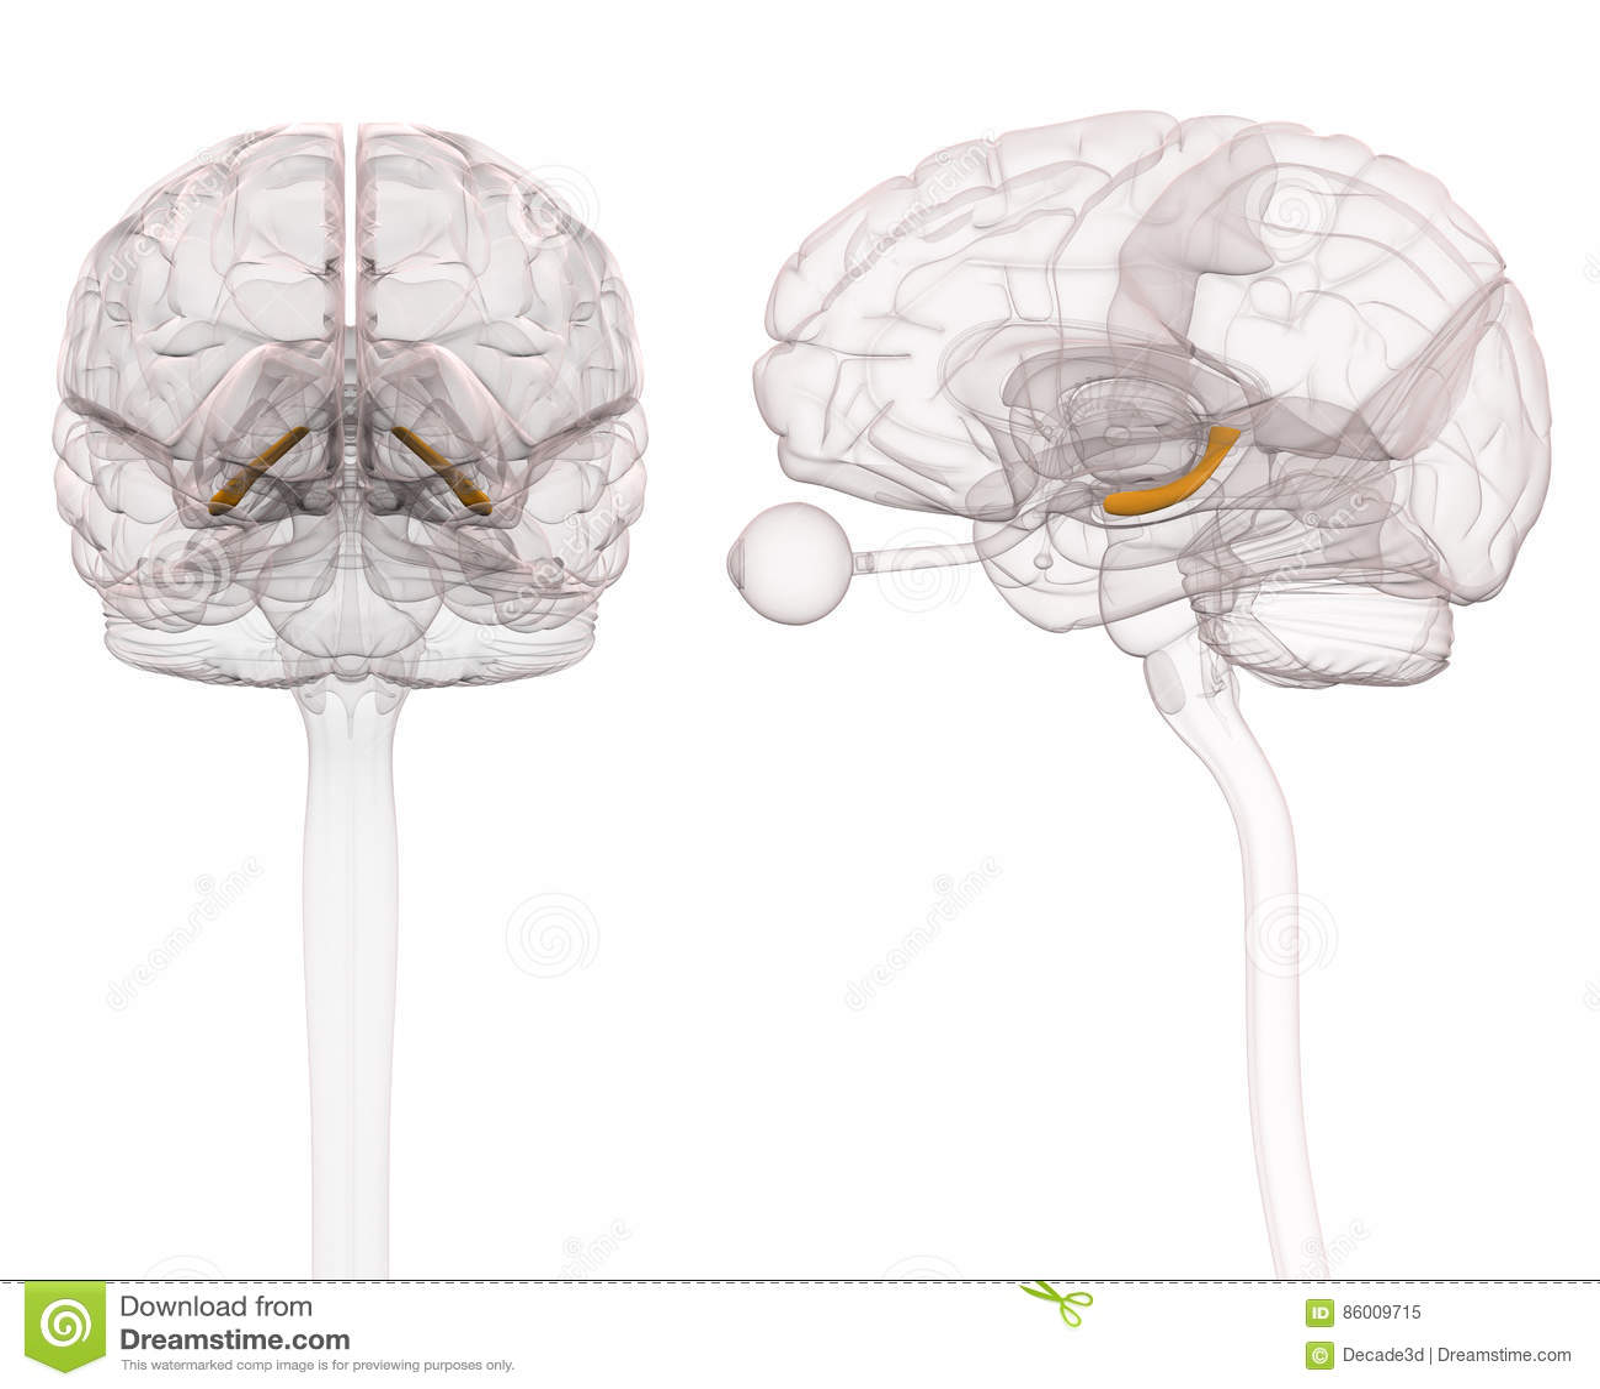 Hippocampus Brain Anatomy - 3d Illustration Stock Illustration ...